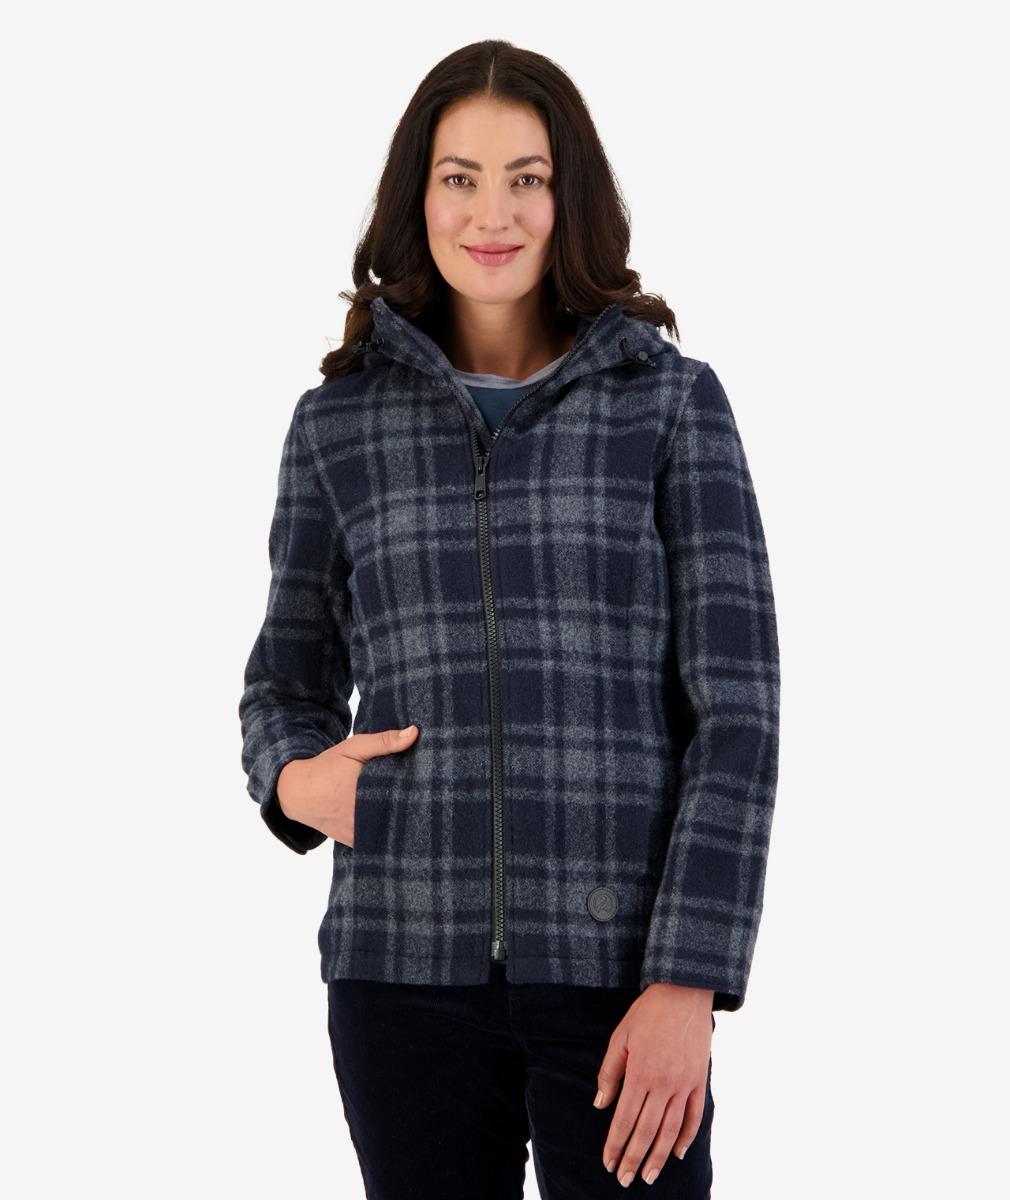 Seattle Women's Wool Hoody Charcoal Grid Check